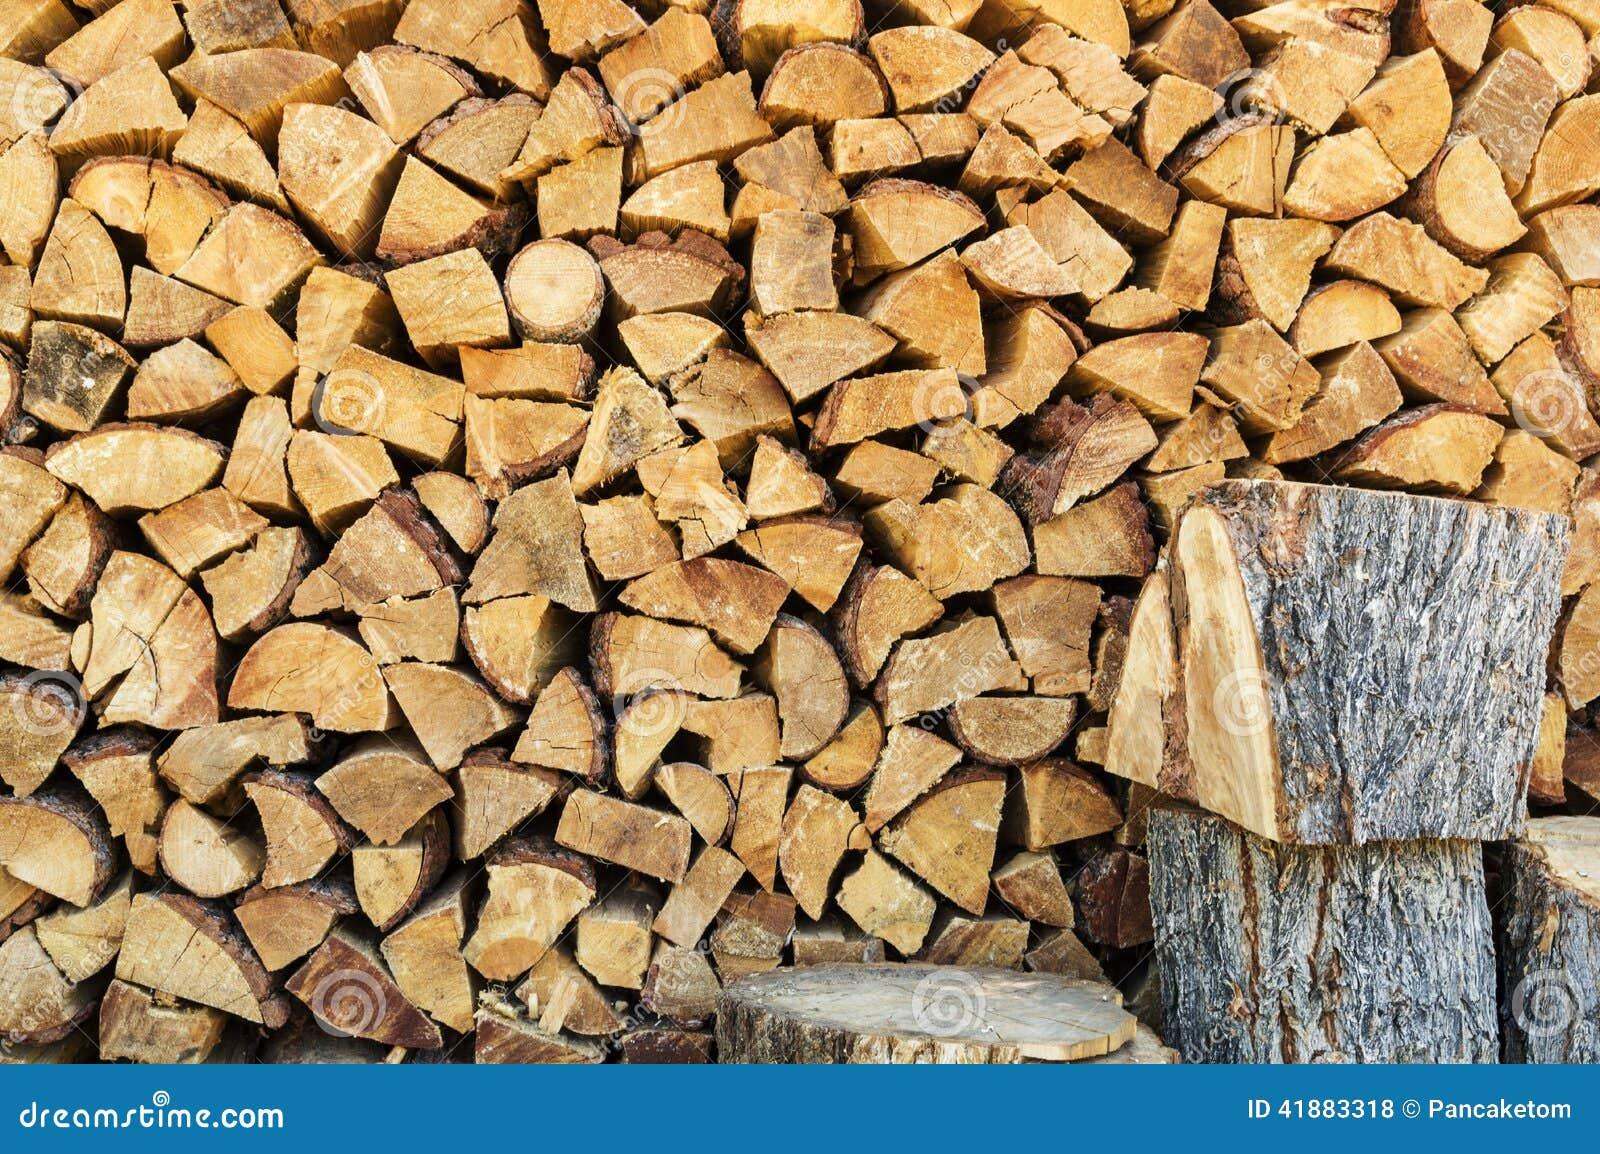 Fire Wood Pile Stock Photo Image 41883318